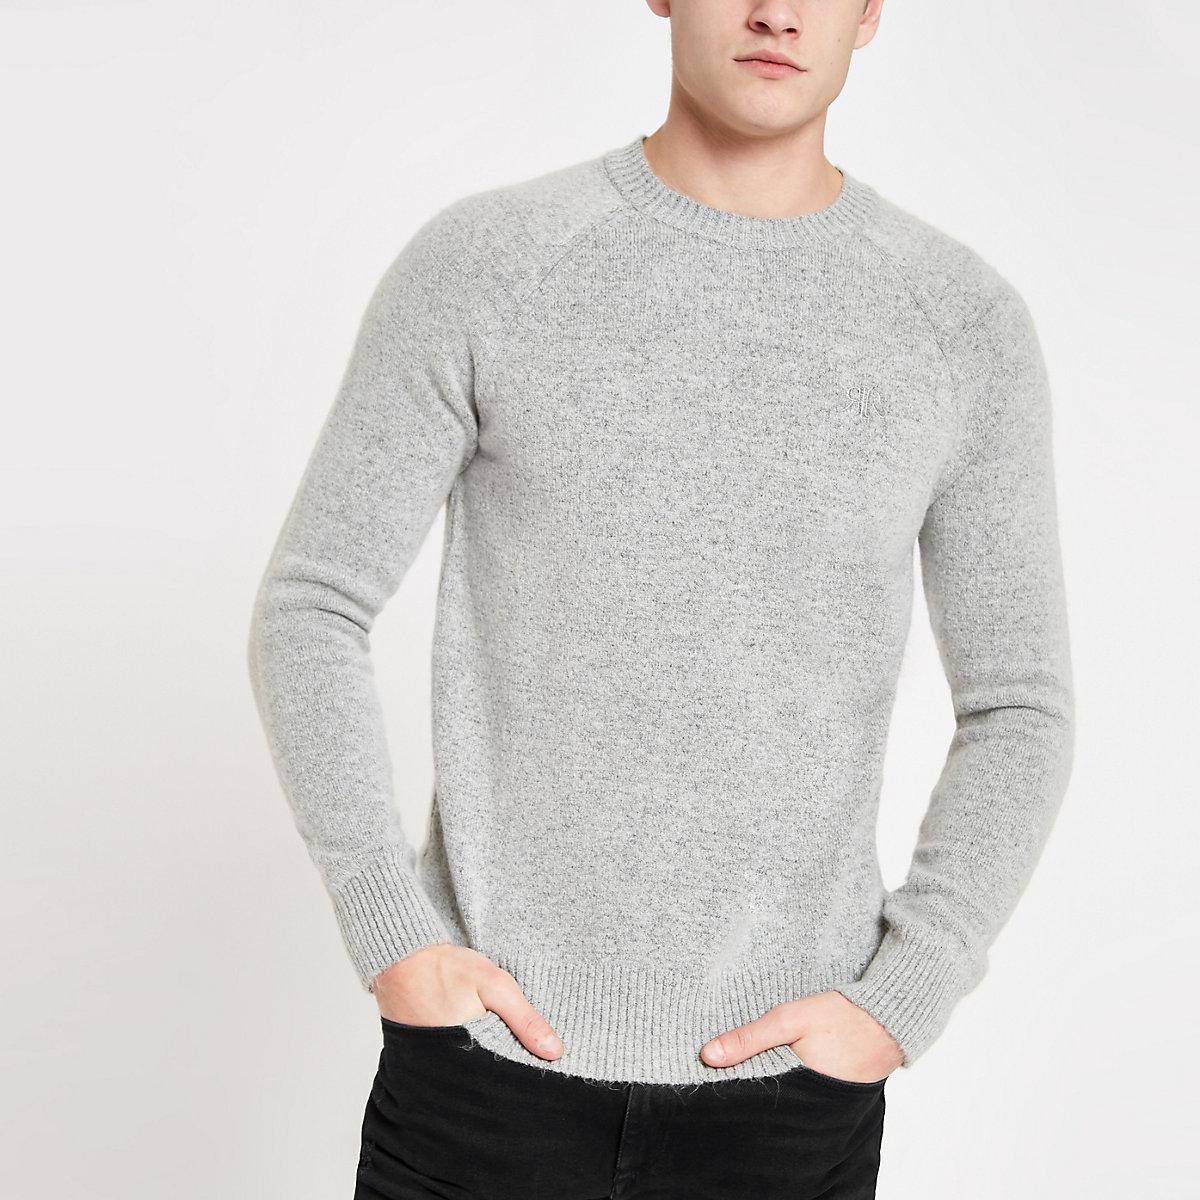 Grey knit slim fit sweater